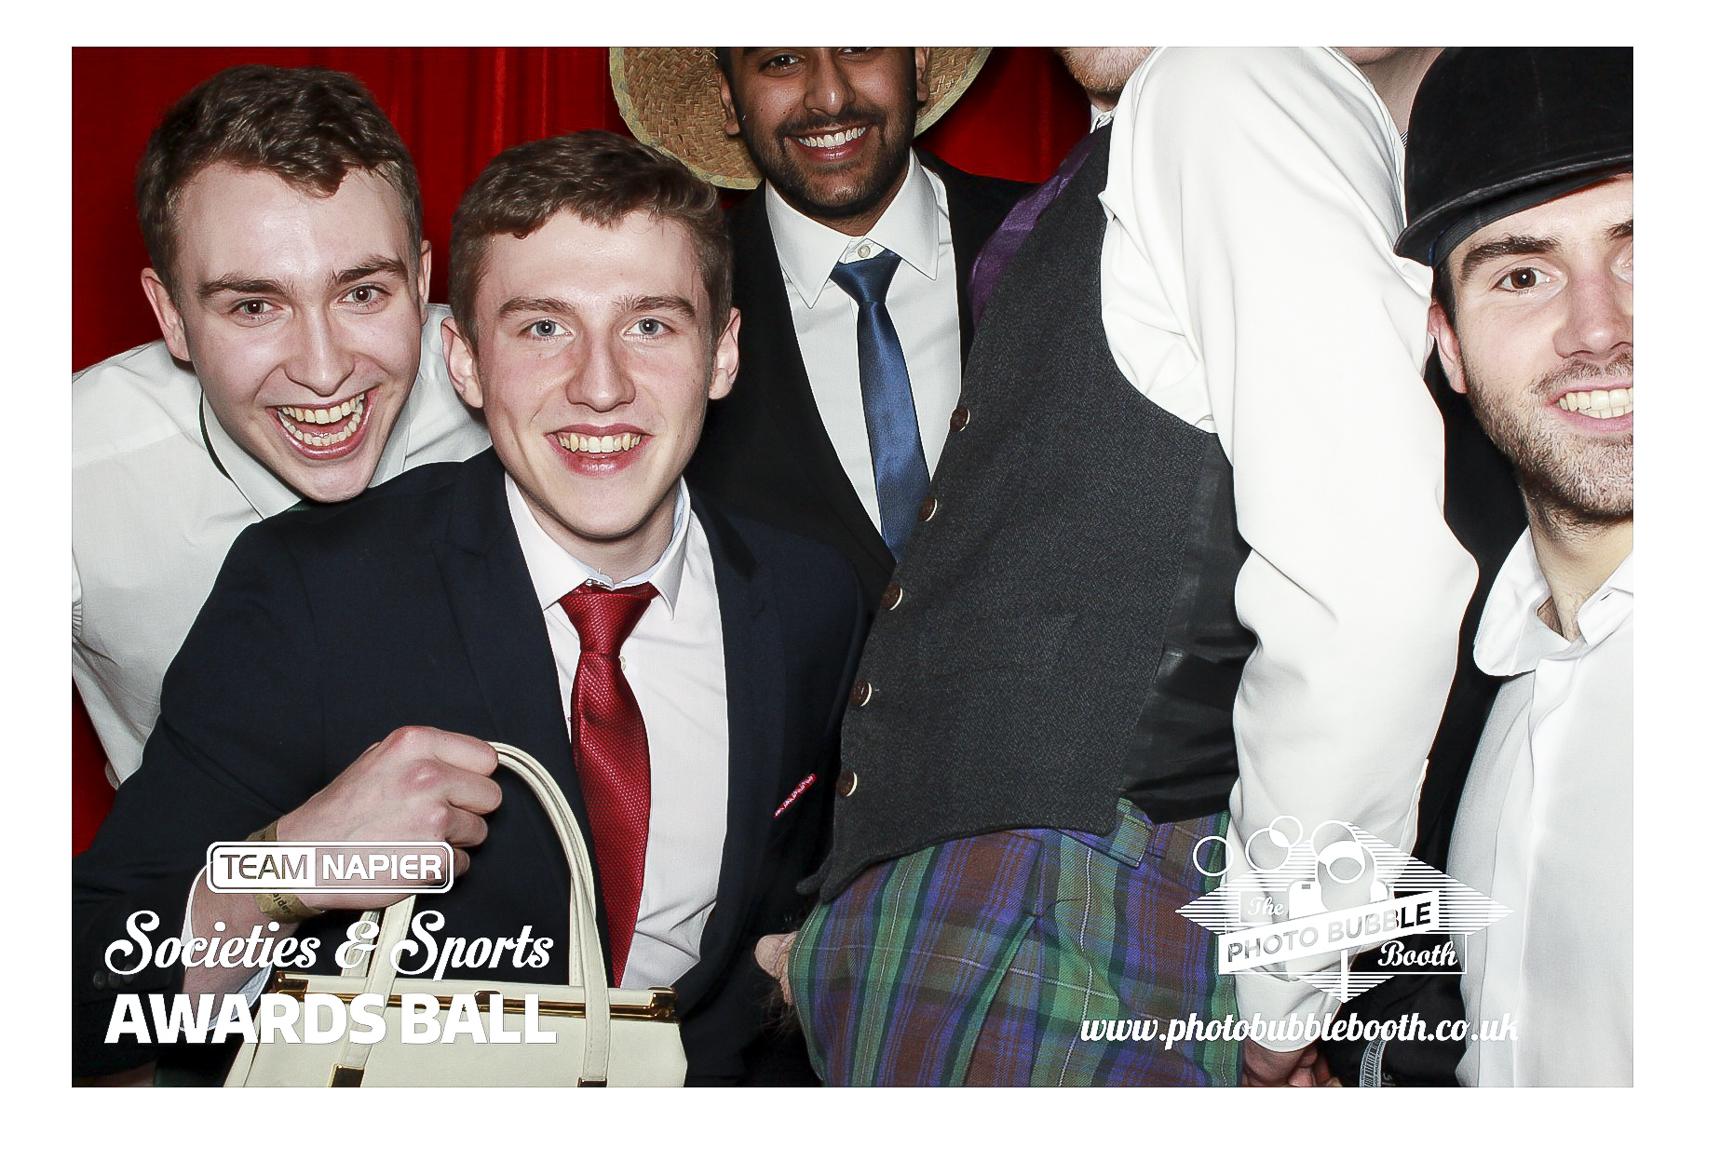 Napier Societies & Sports Awards_109.JPG